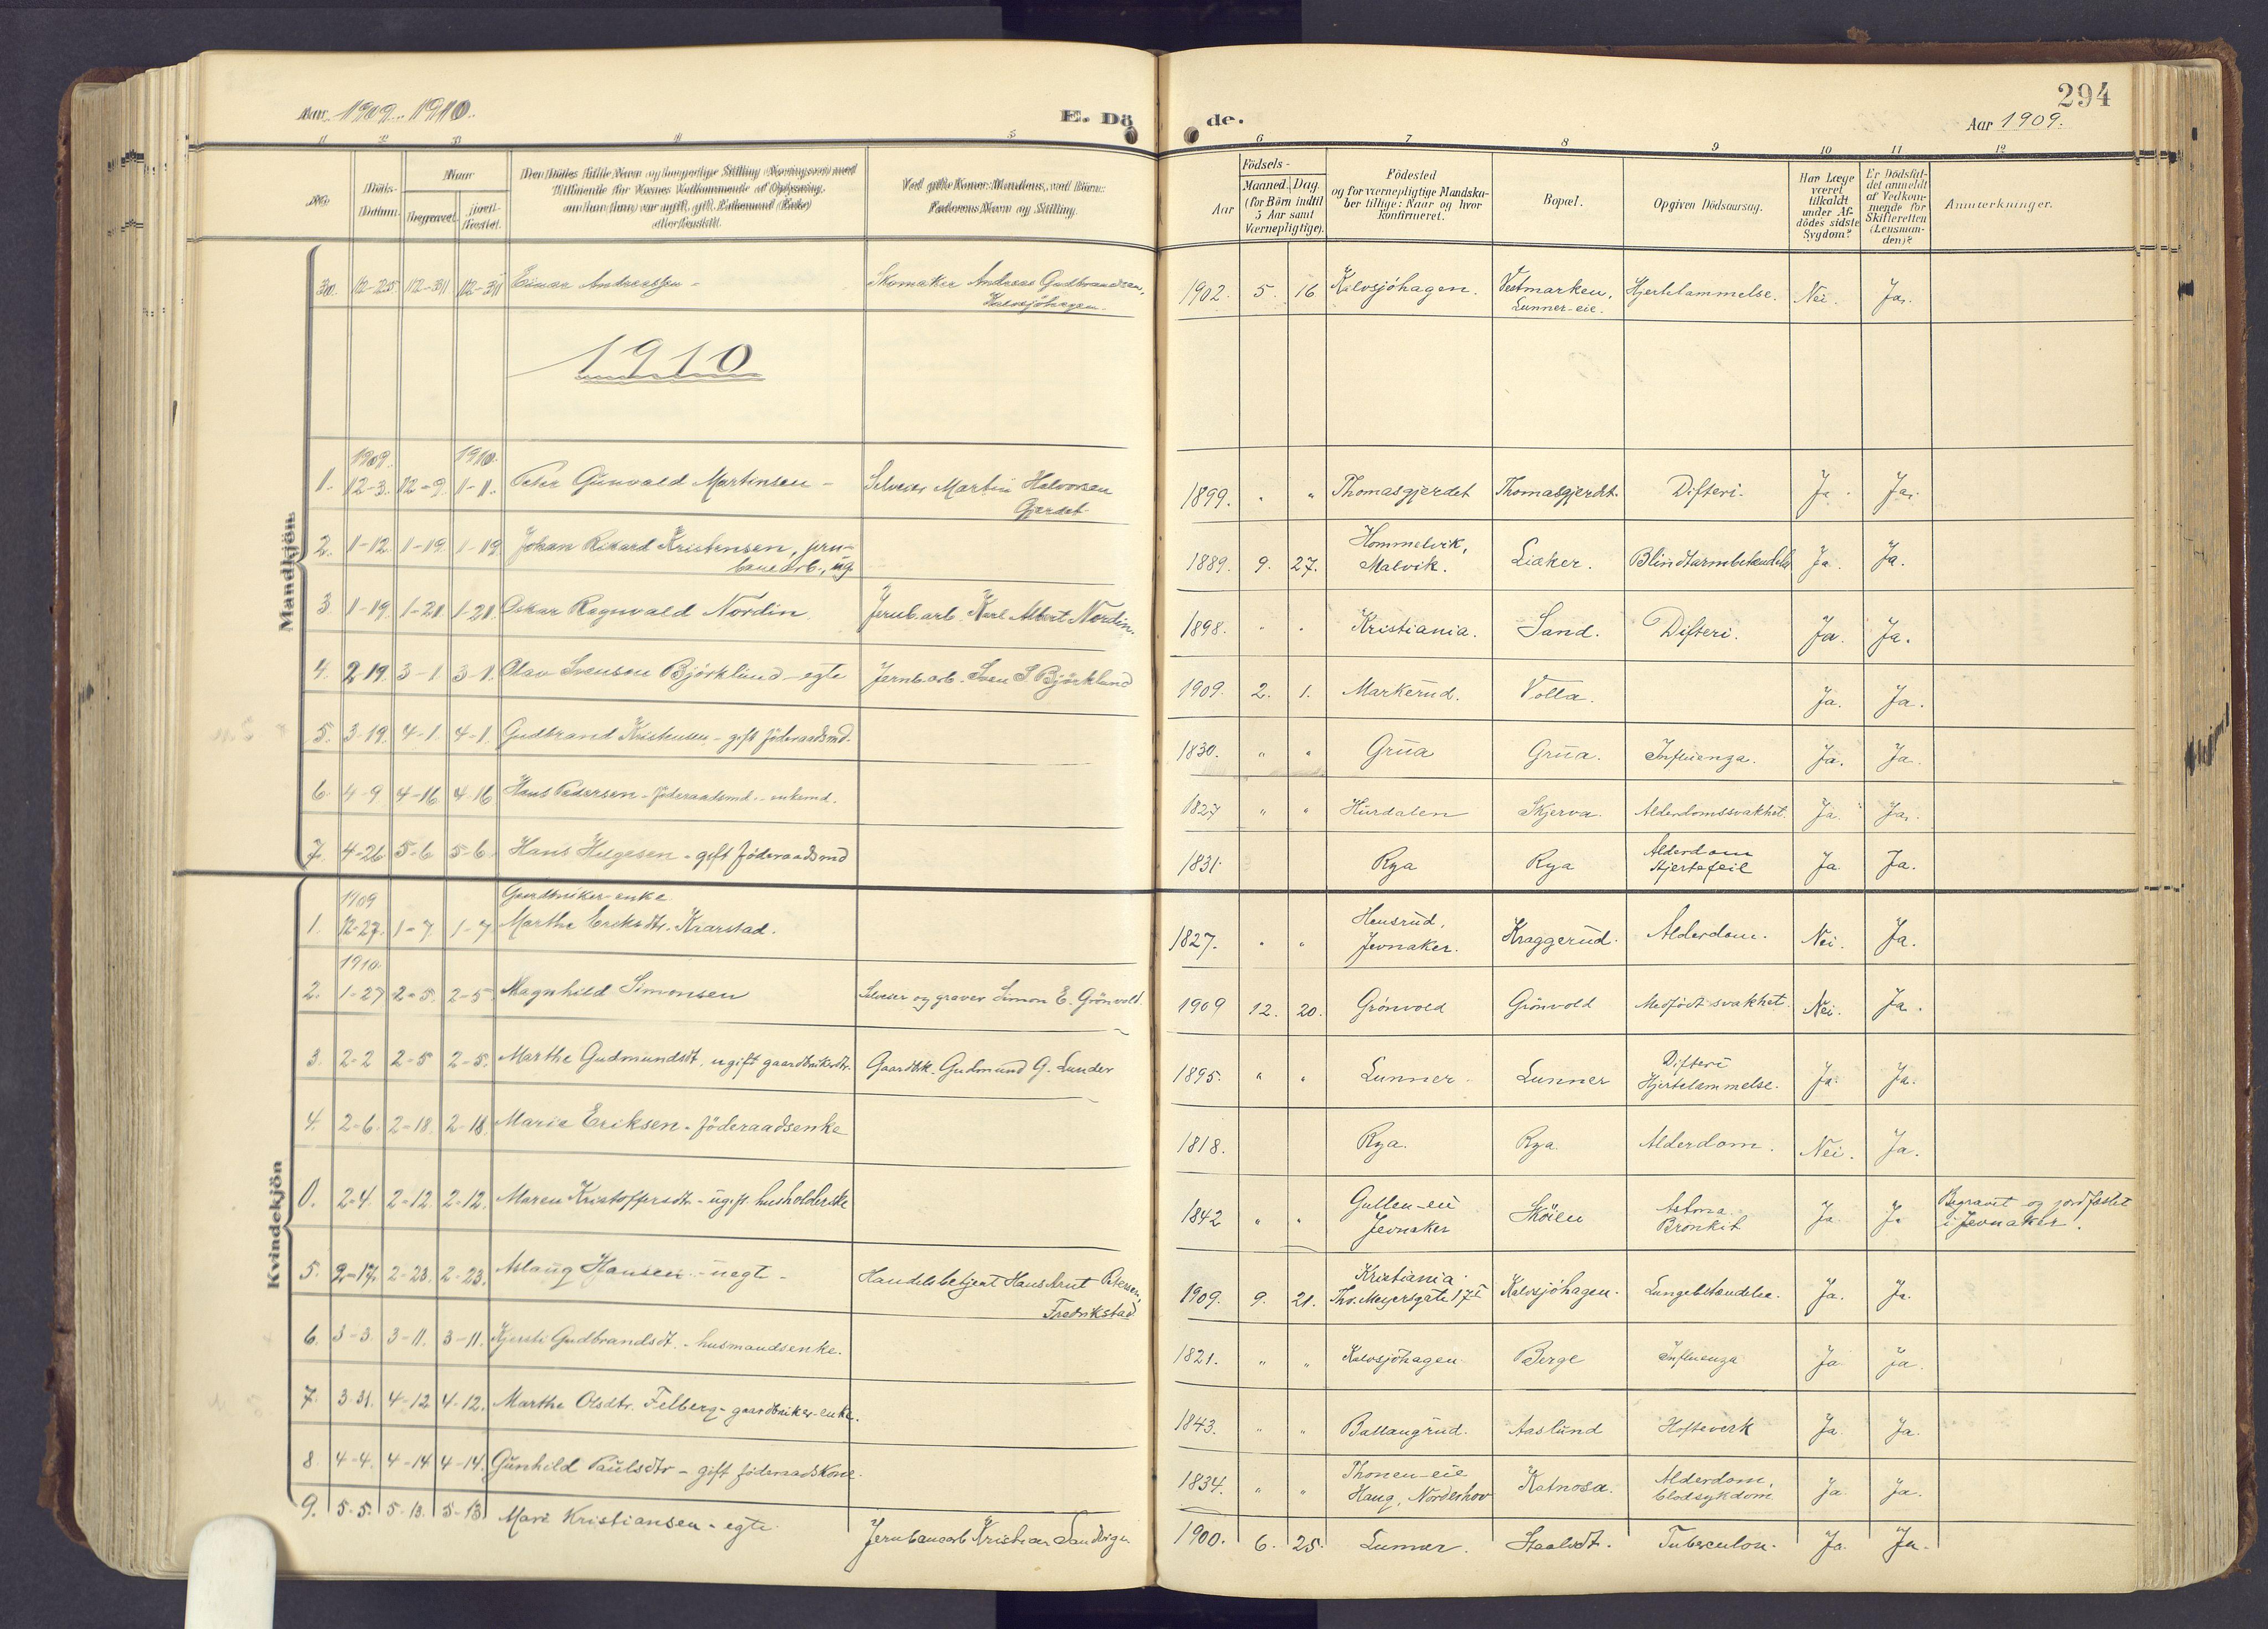 SAH, Lunner prestekontor, H/Ha/Haa/L0001: Ministerialbok nr. 1, 1907-1922, s. 294